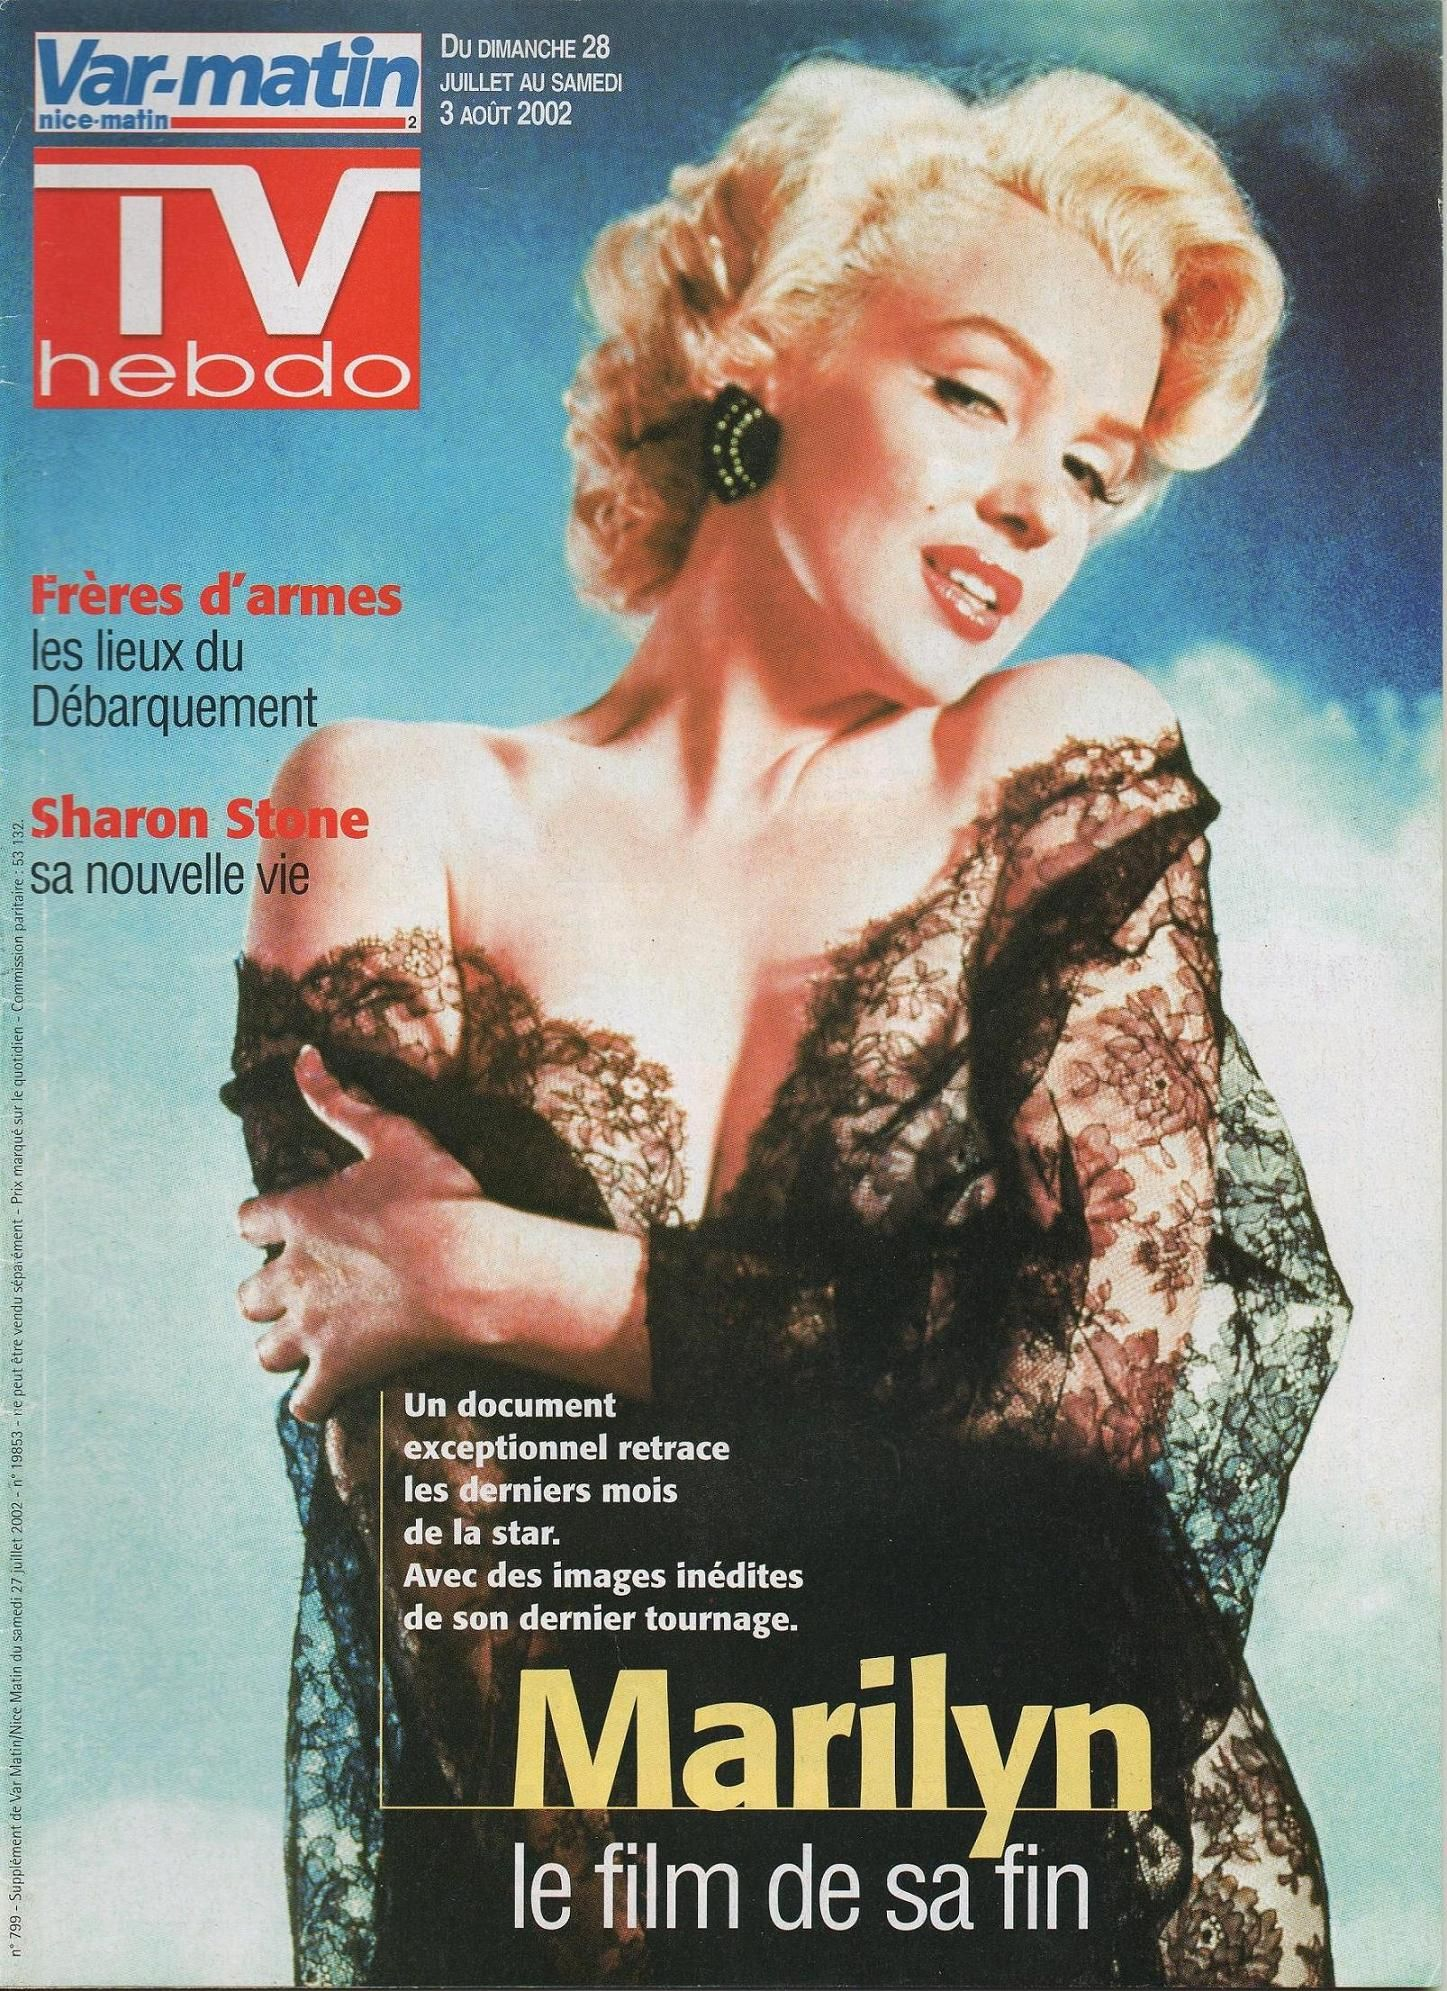 2002-07-28-tv_hebdo-france